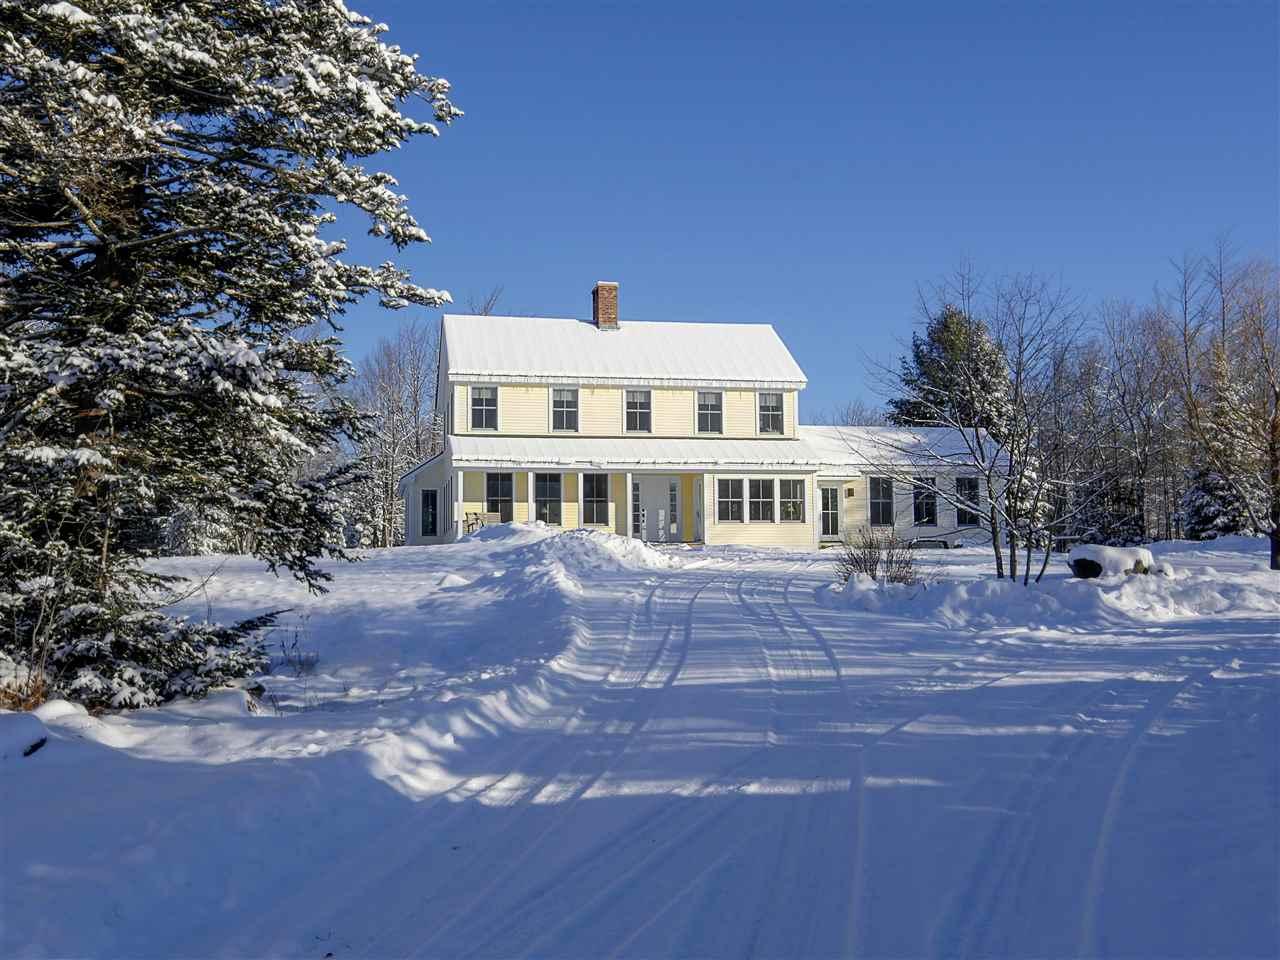 Mount-Snow-Real-Estate-4517321-3